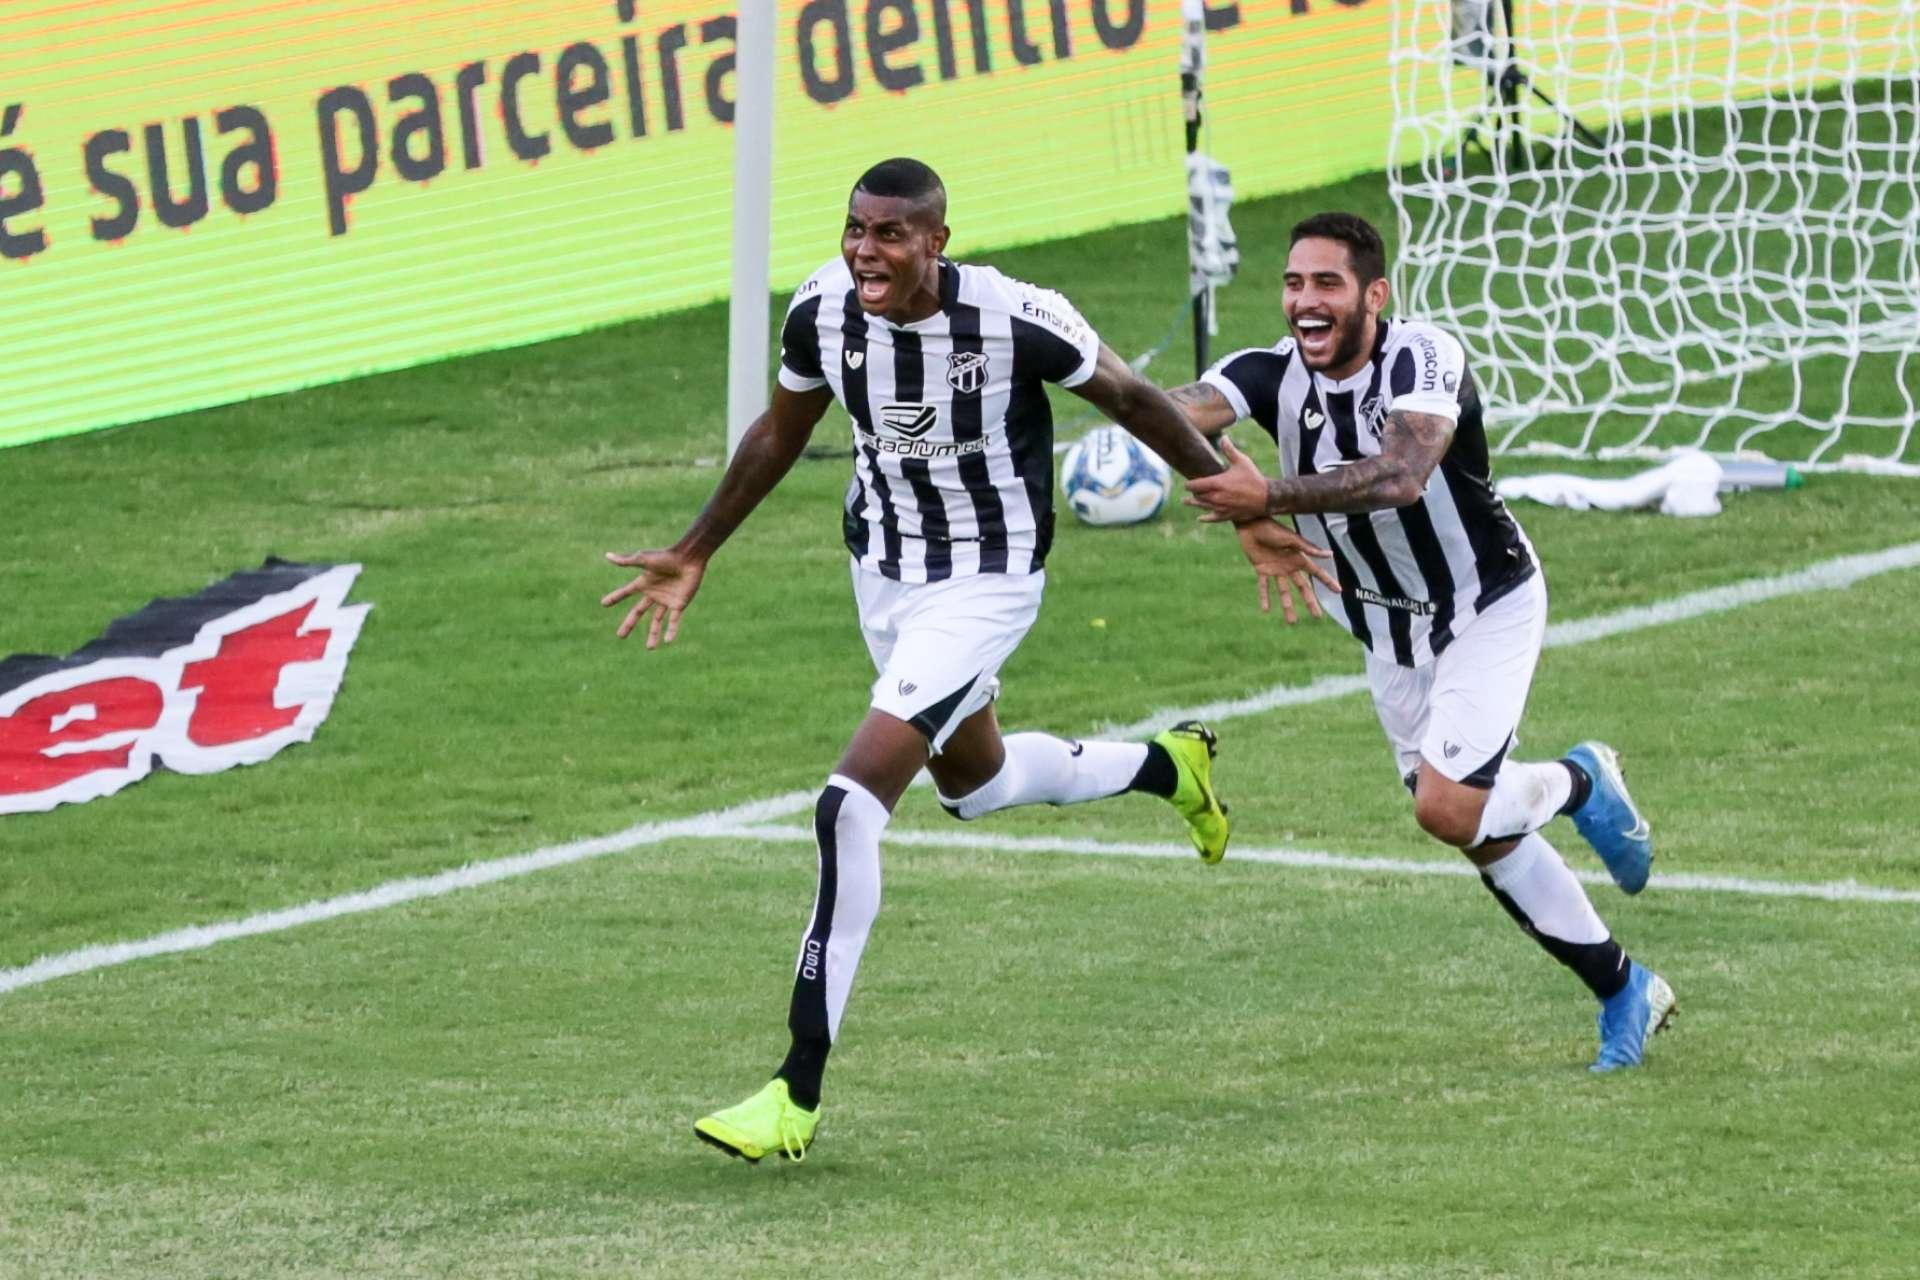 Mateus Gonçalves marcou o terceiro tento do Alvinegro